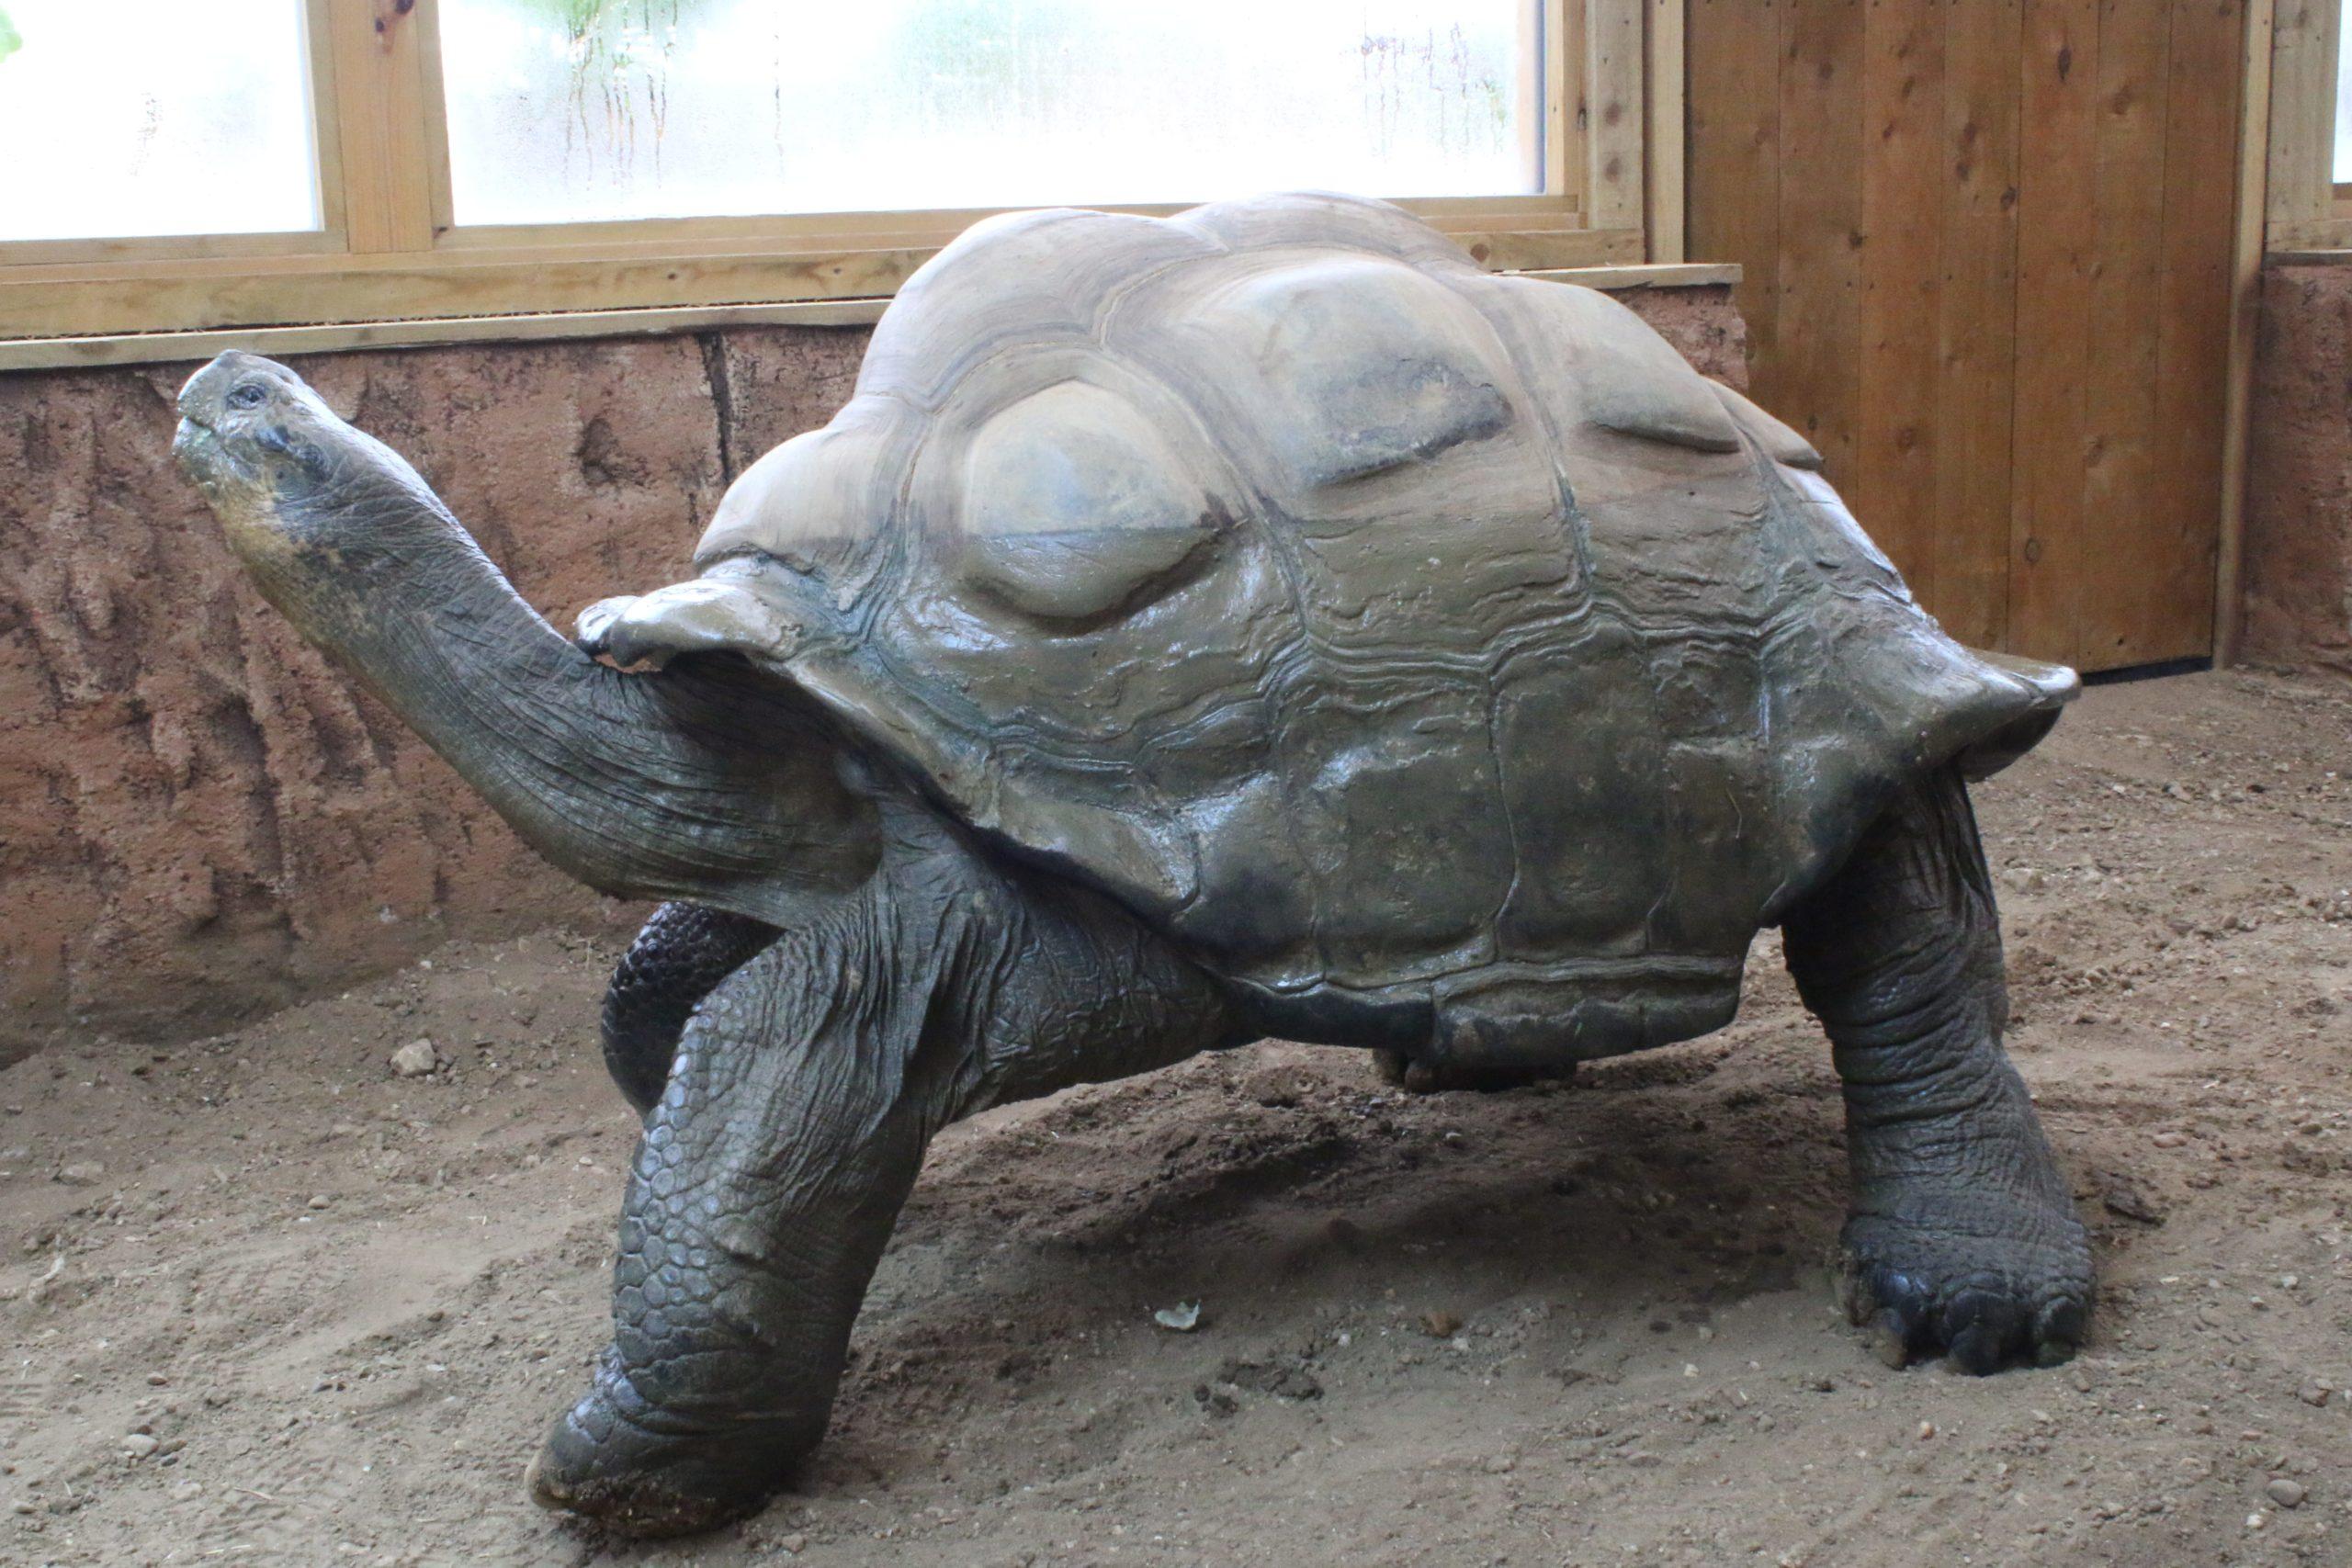 Giant Galapagos Tortoise Experience